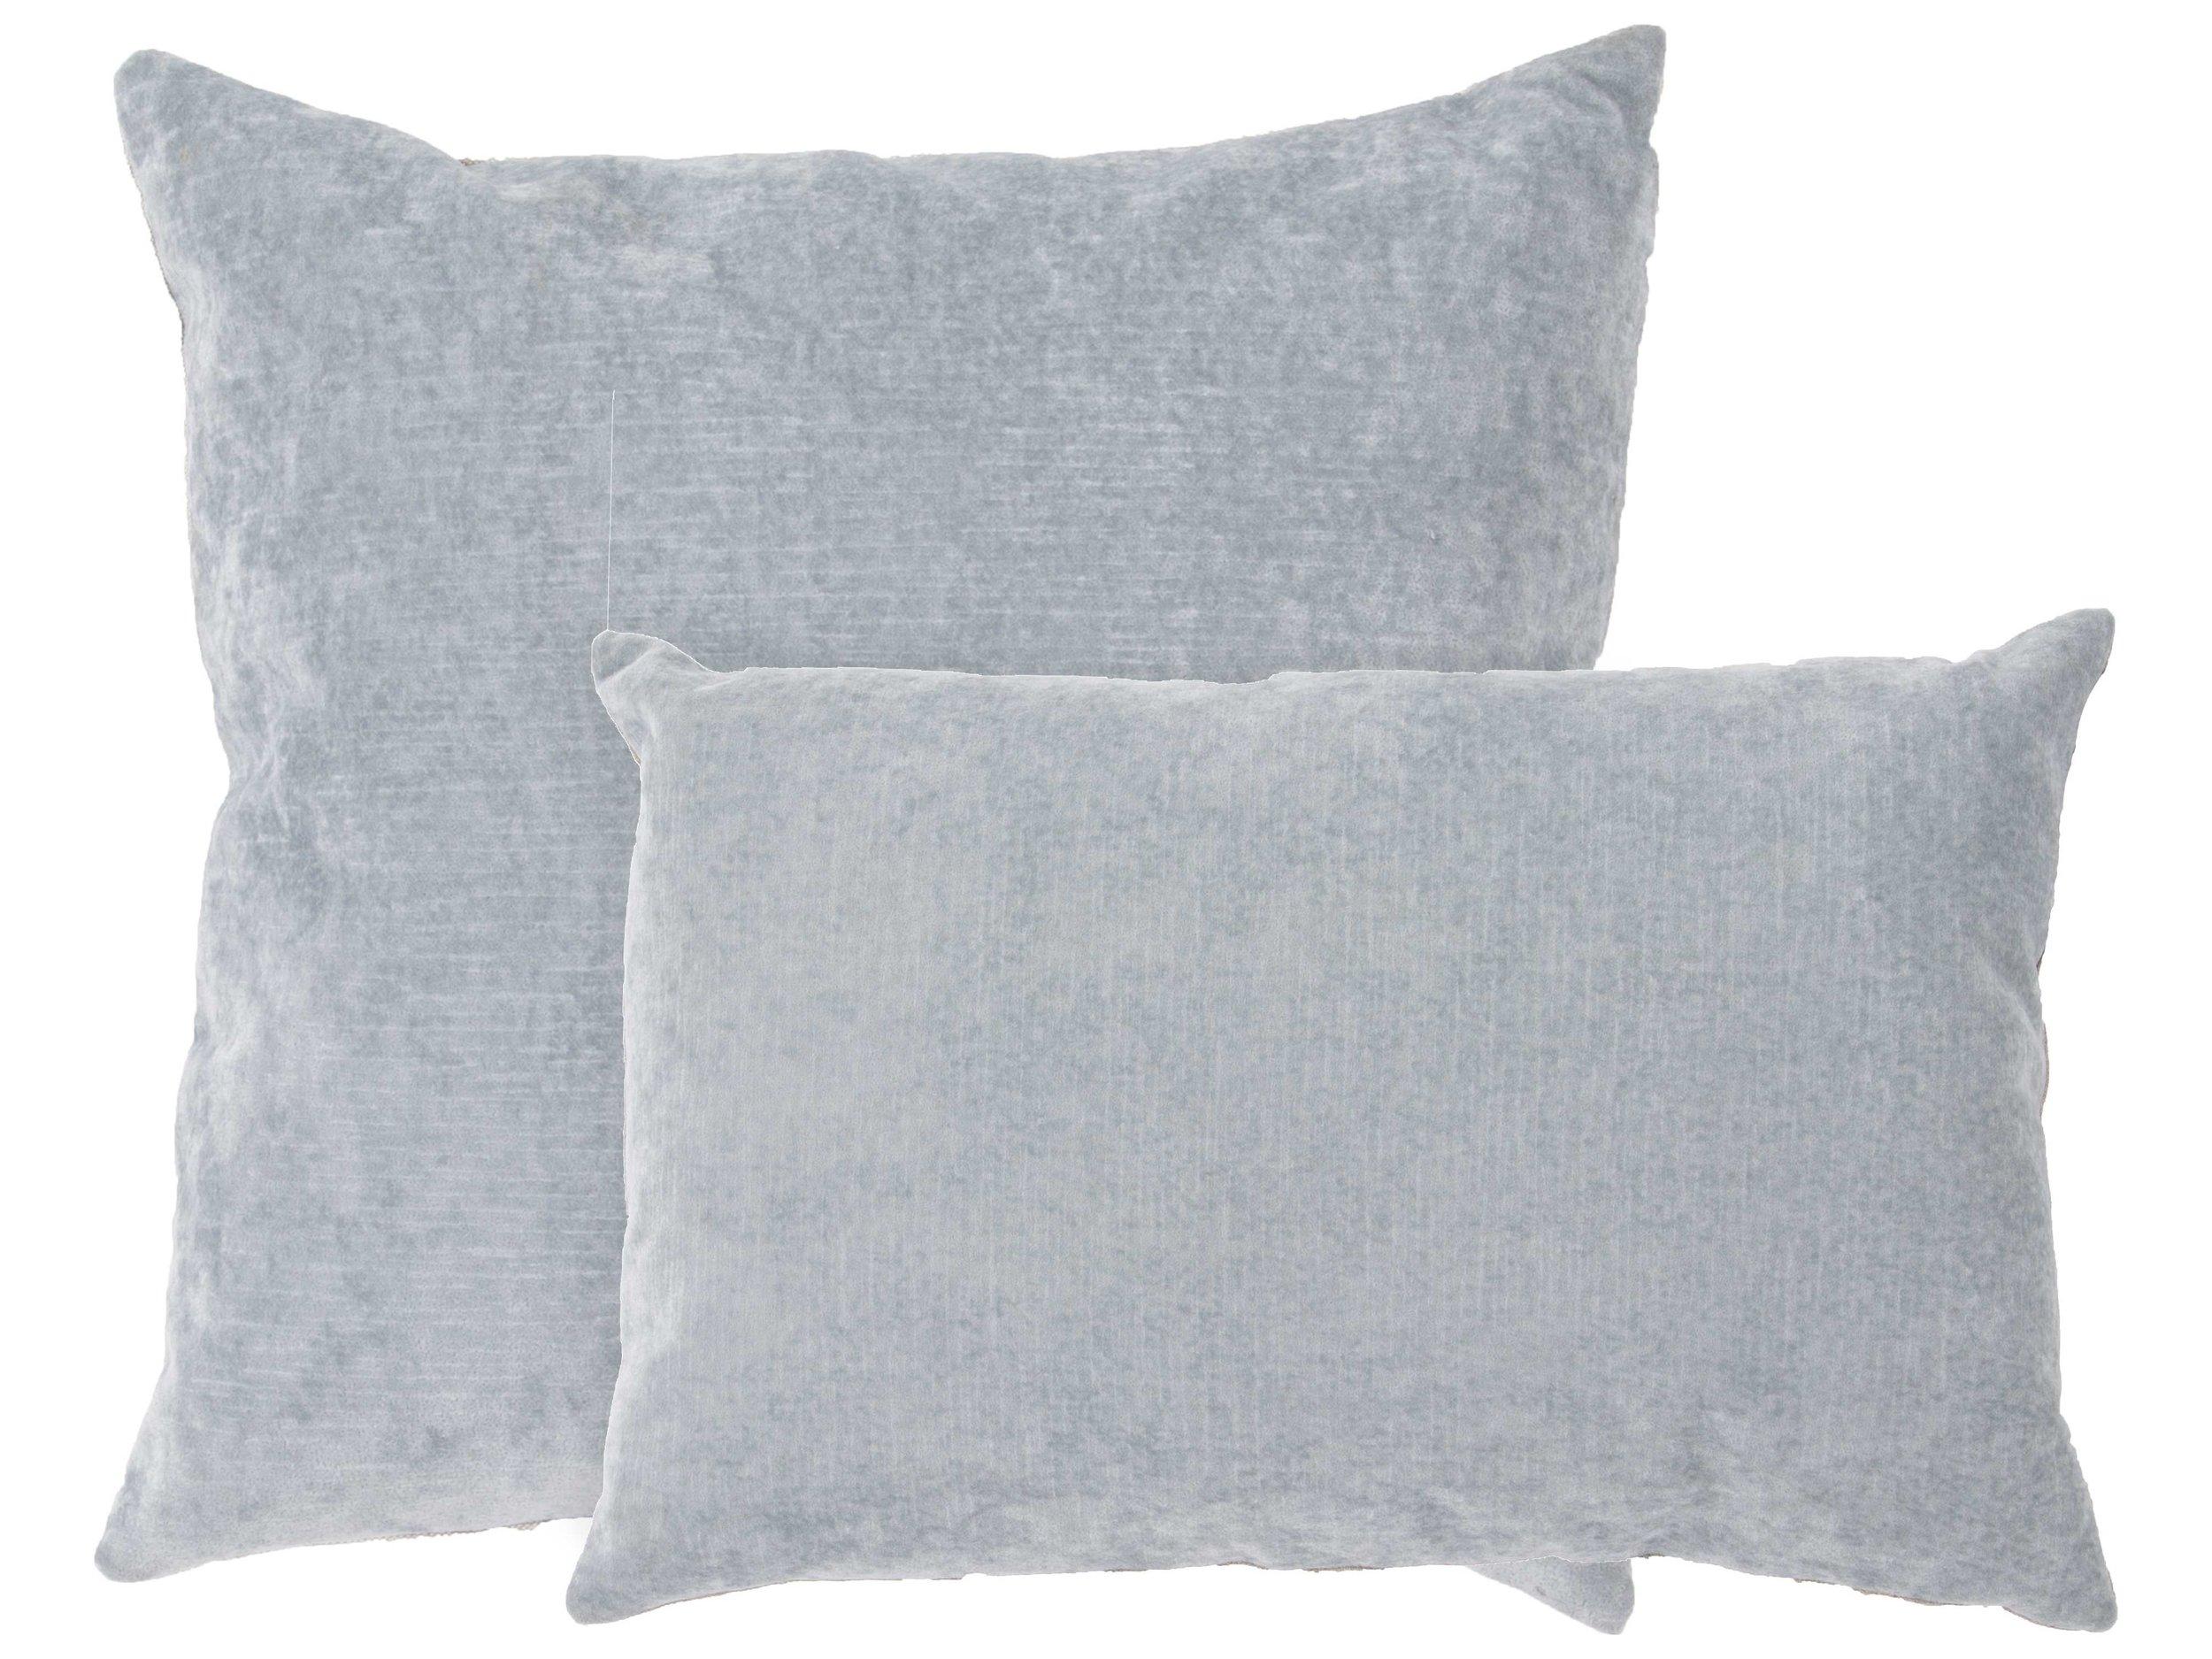 Luxe Rectangular Pillow - Jaipur Rugs pearl blue lumbar pillow, $83; Luxe Decor